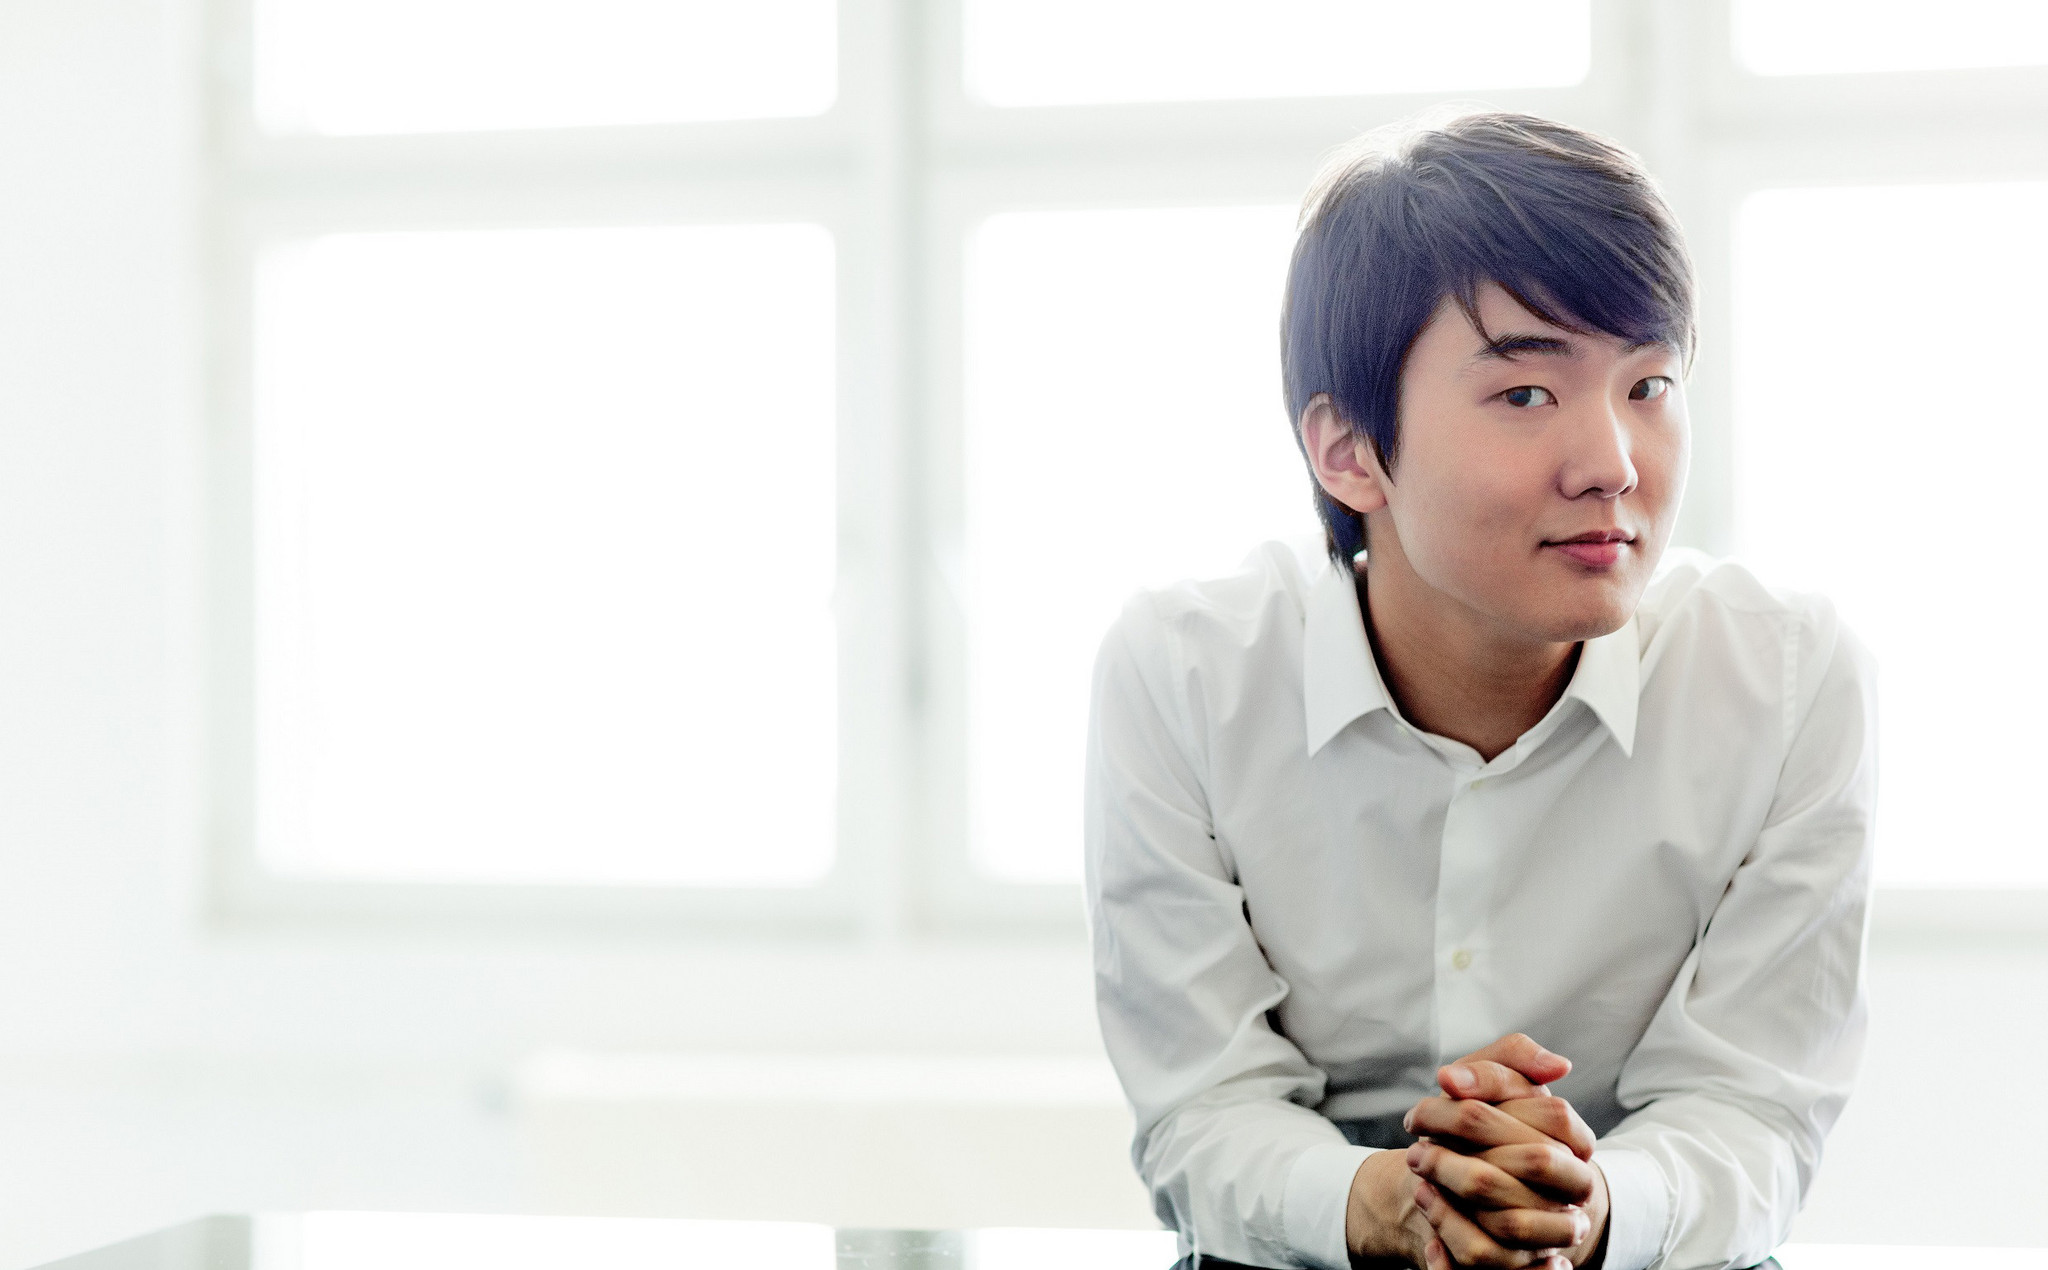 Seong-Jin_Cho_2016-08_B2A9365b.jpg